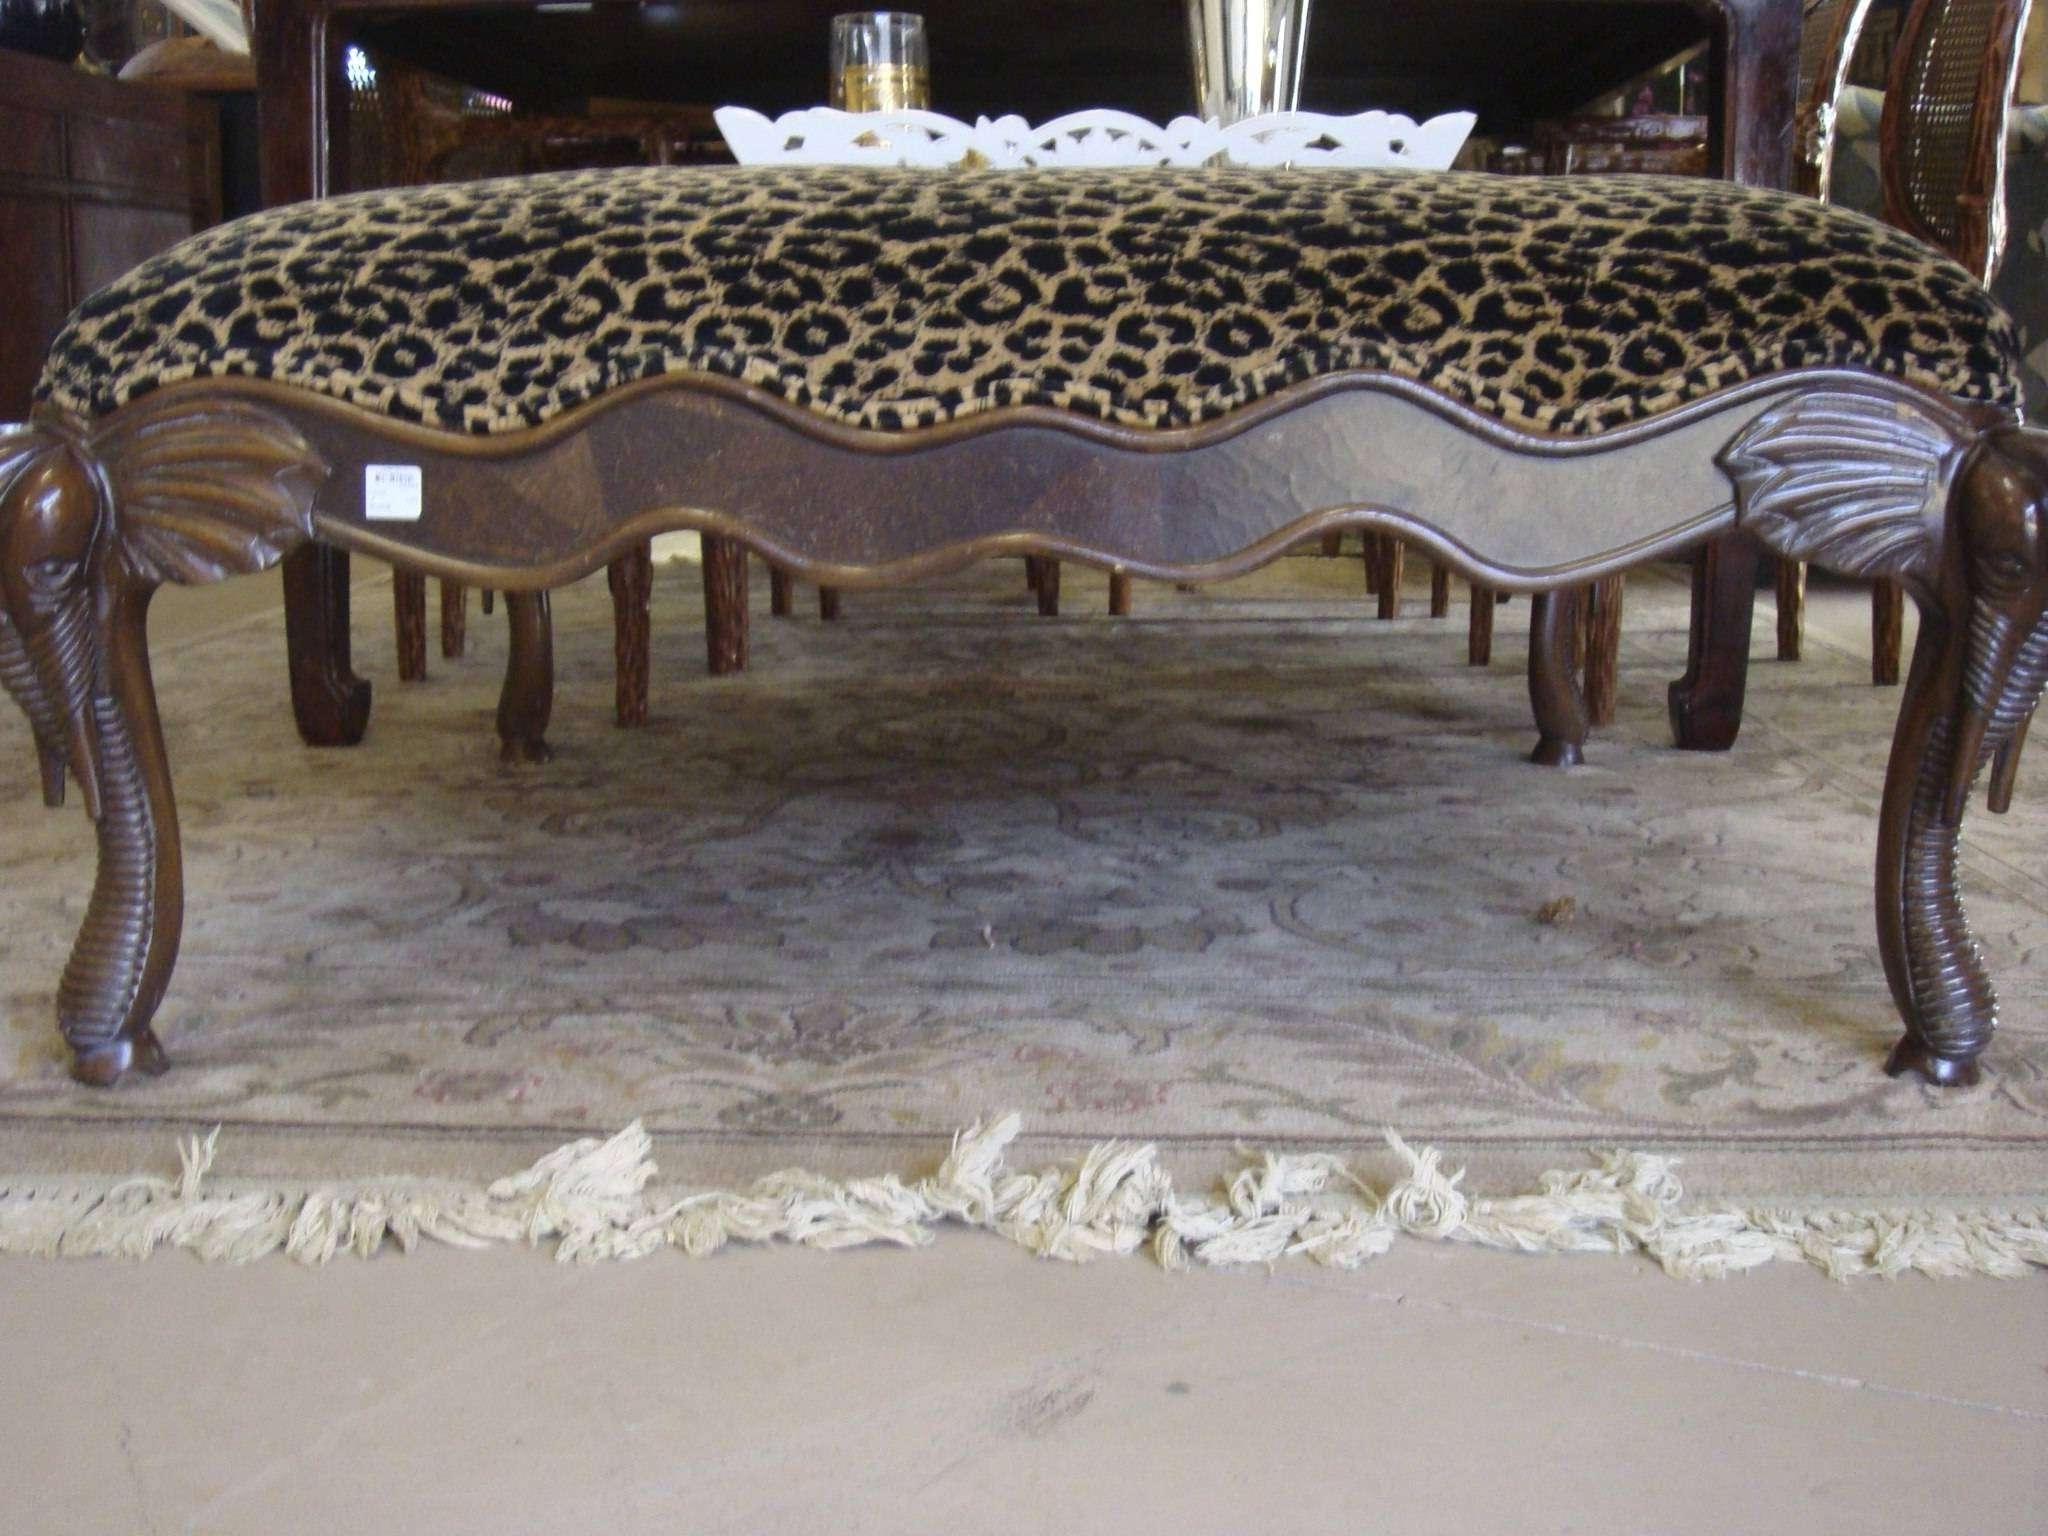 Coffee Table Fresh Wonderful Leopard Print Ottomans Storage 20563 Regarding Current Animal Print Ottoman Coffee Tables (View 10 of 20)